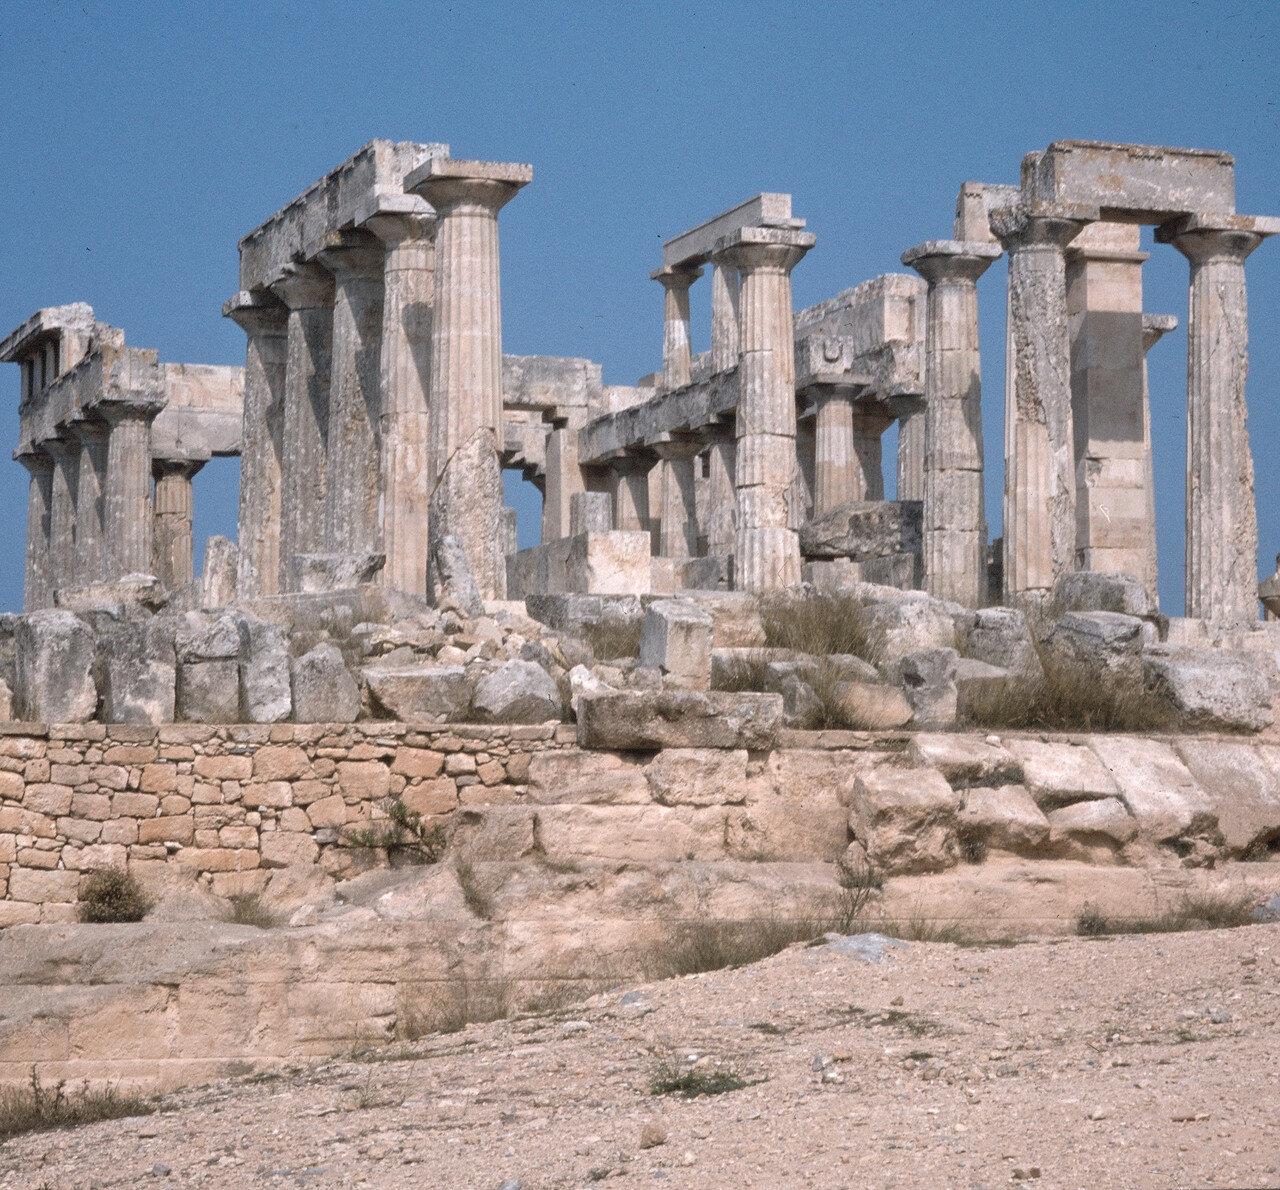 10.  Целла храма состояла из пронаоса с двумя колоннами в антах, такого же описфодома и наоса, разделенного на три корабля двумя двухъярусными колоннадами. На снимке: вид целлы с запада